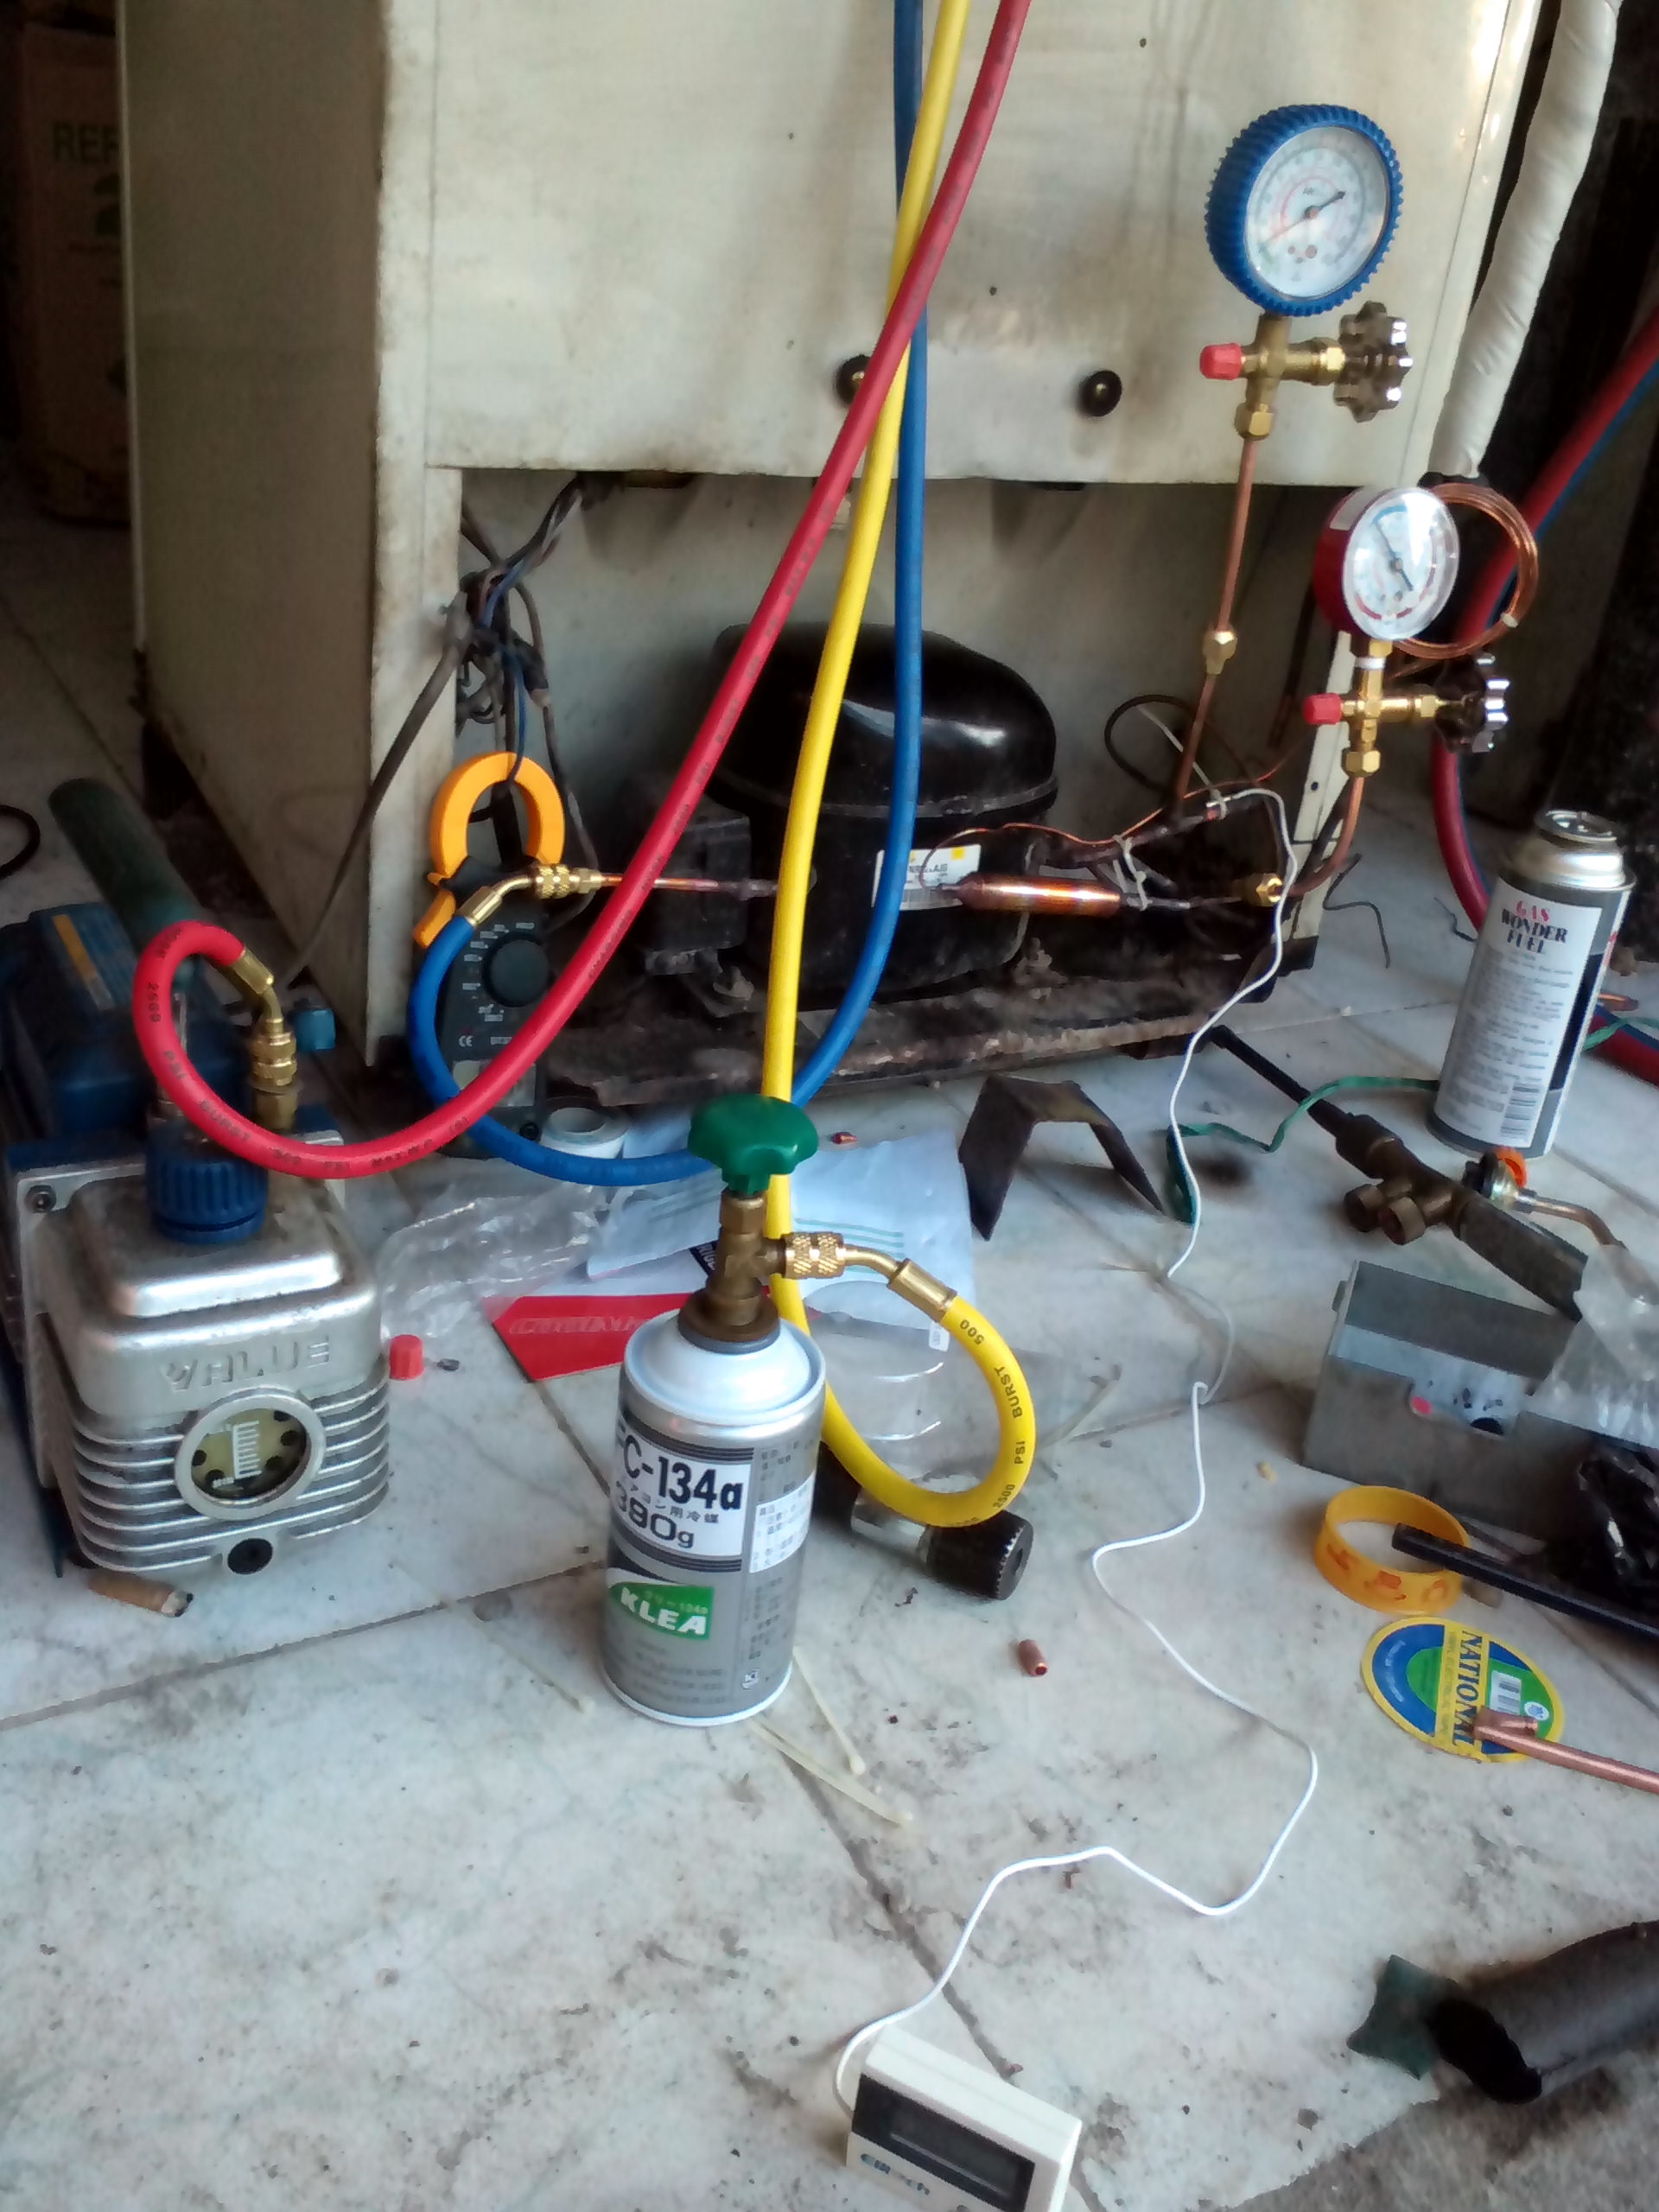 Penelitian mengenai penggunaan refrigeran hidrokarbon yang dilakukan oleh penulis